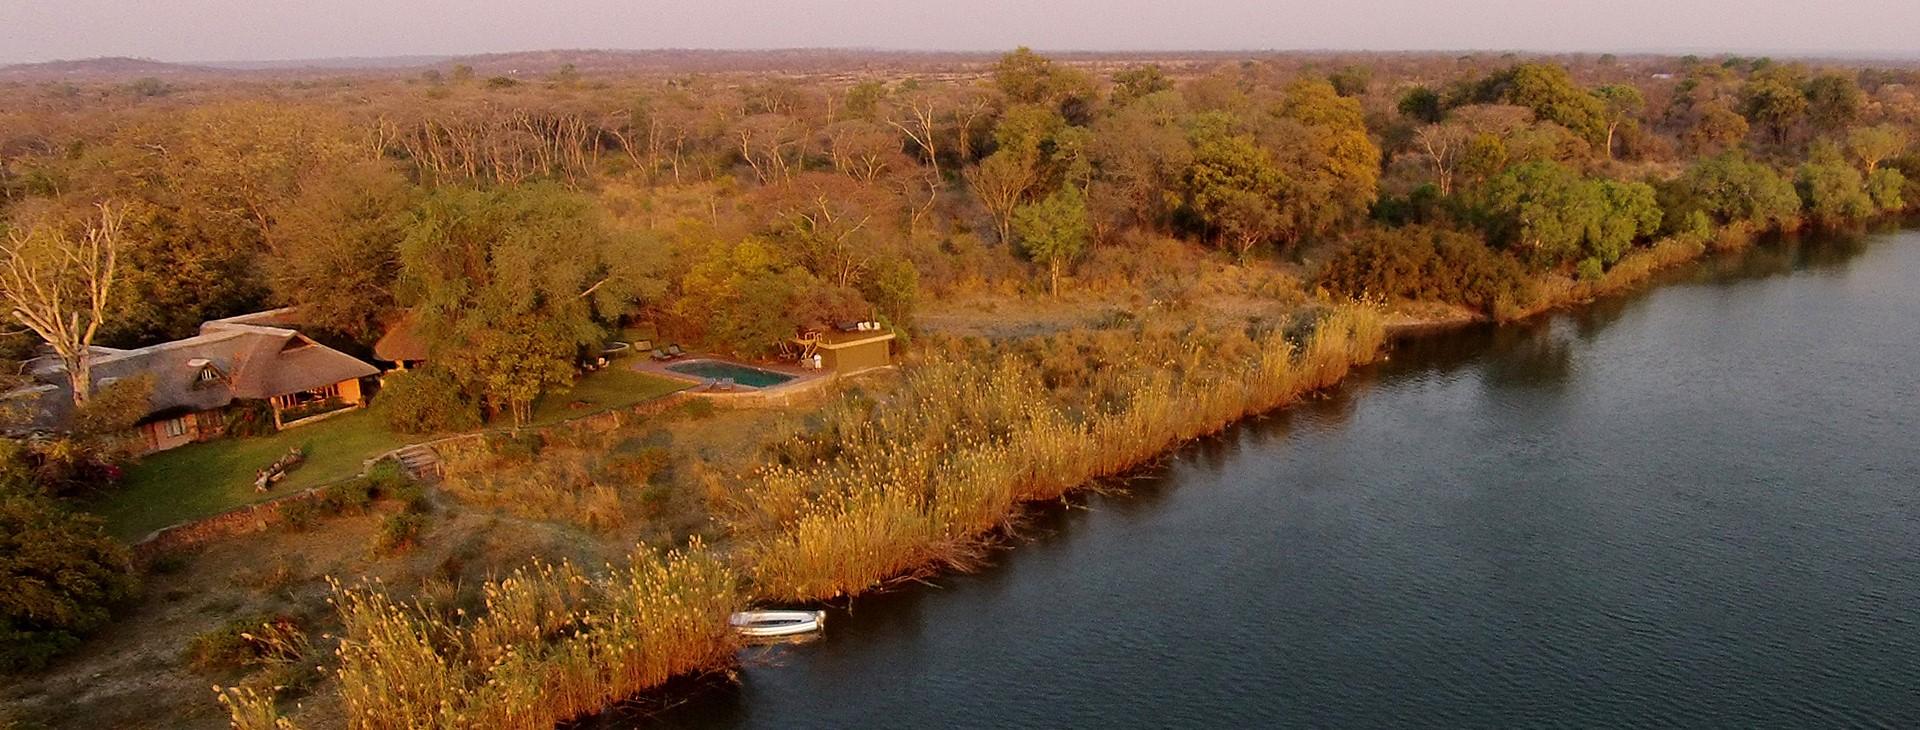 tangala-family-home-zambezi-aerial